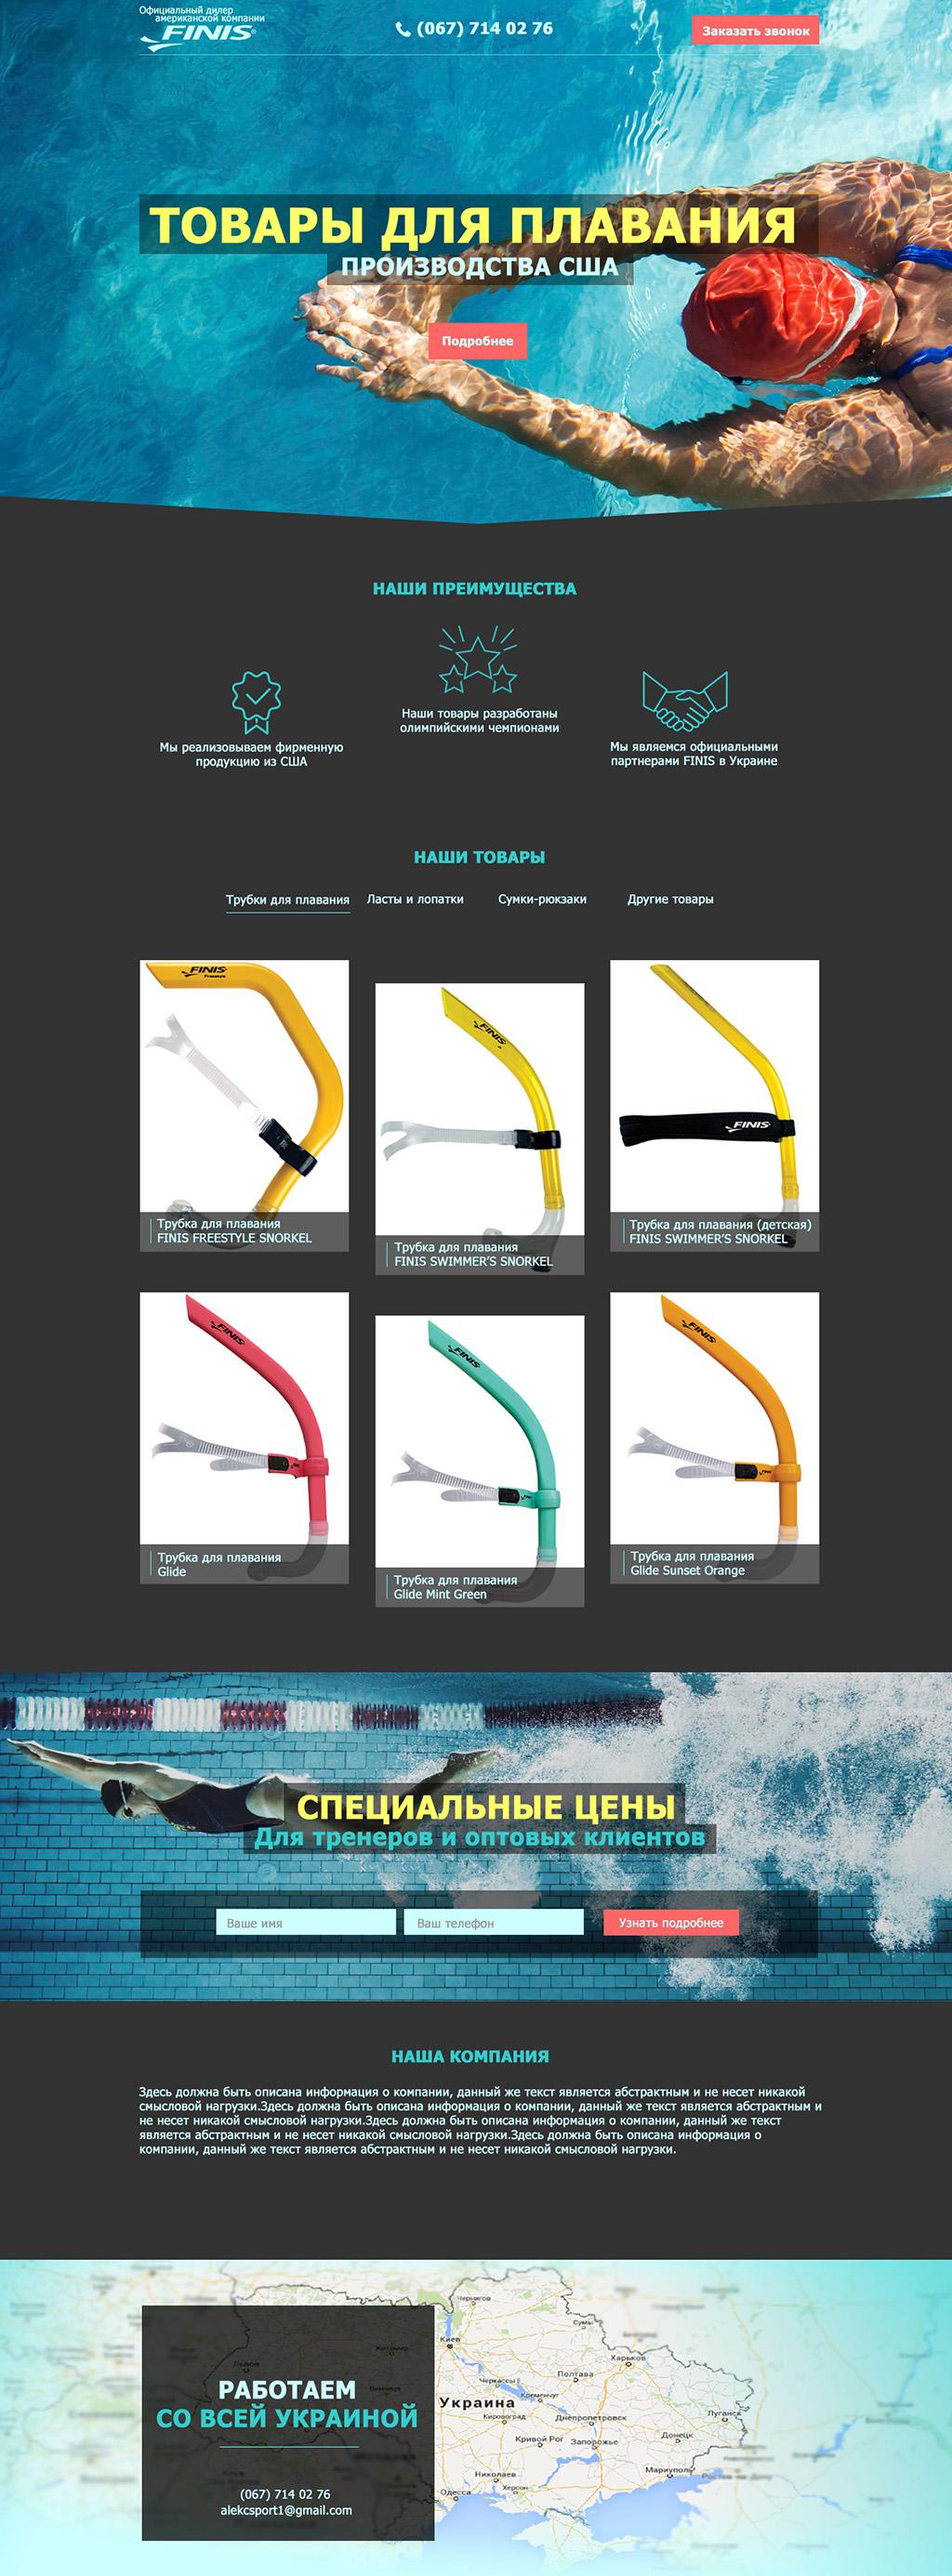 Landing Page — Товары для Плавания